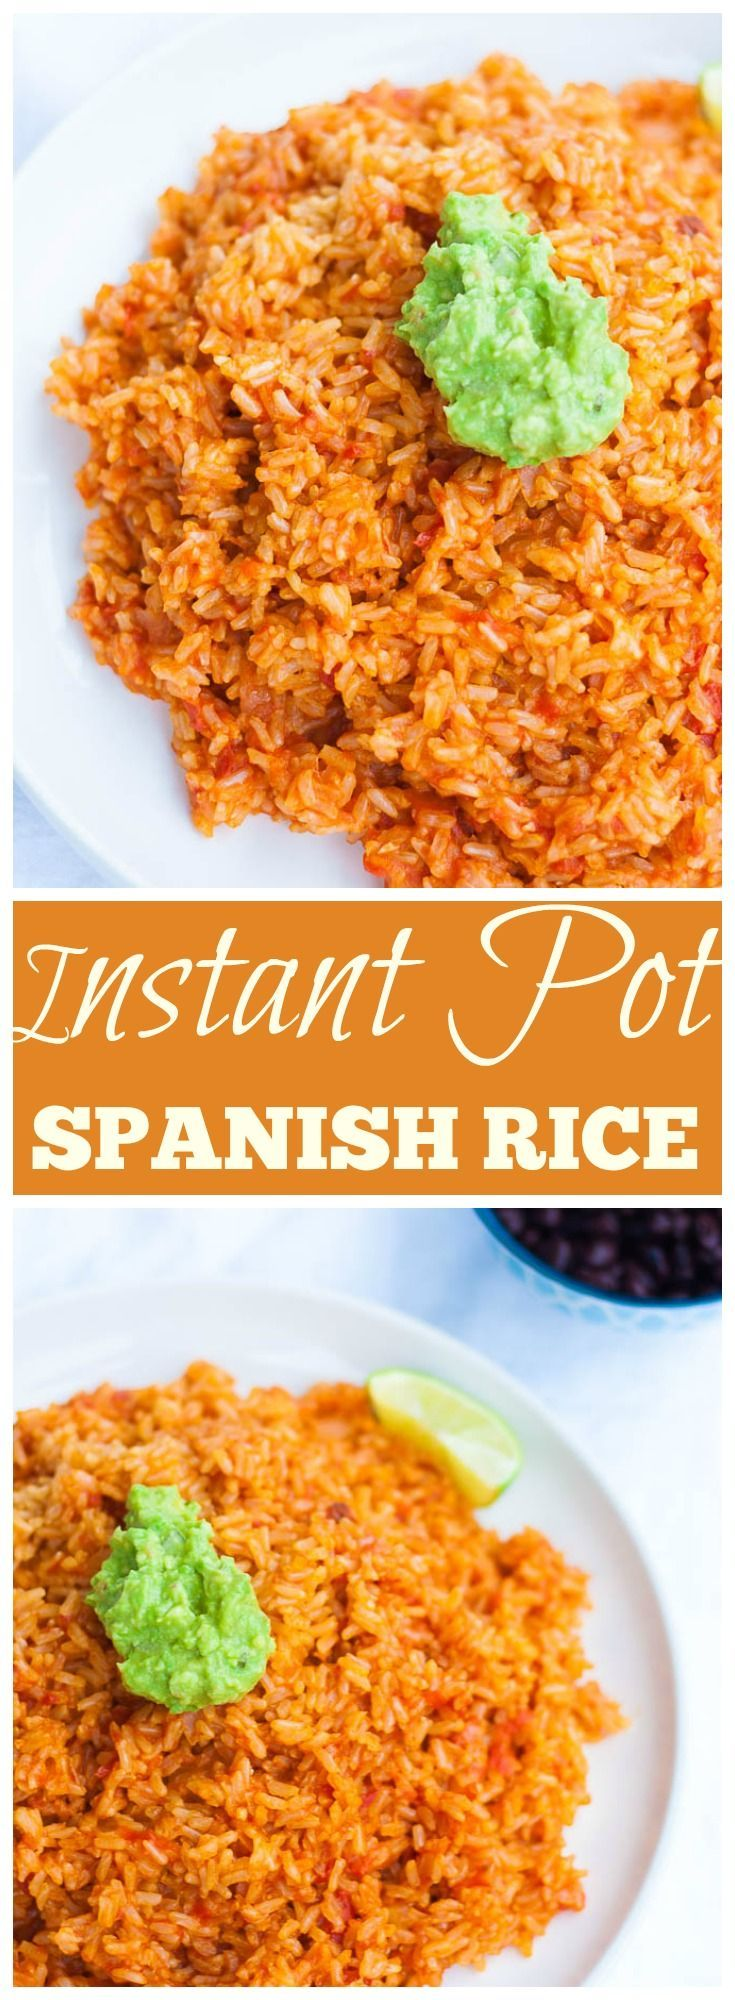 Vegan/ Gluten Free Instant Pot Spanish Rice. 5 Ingredients, 30 minutes.